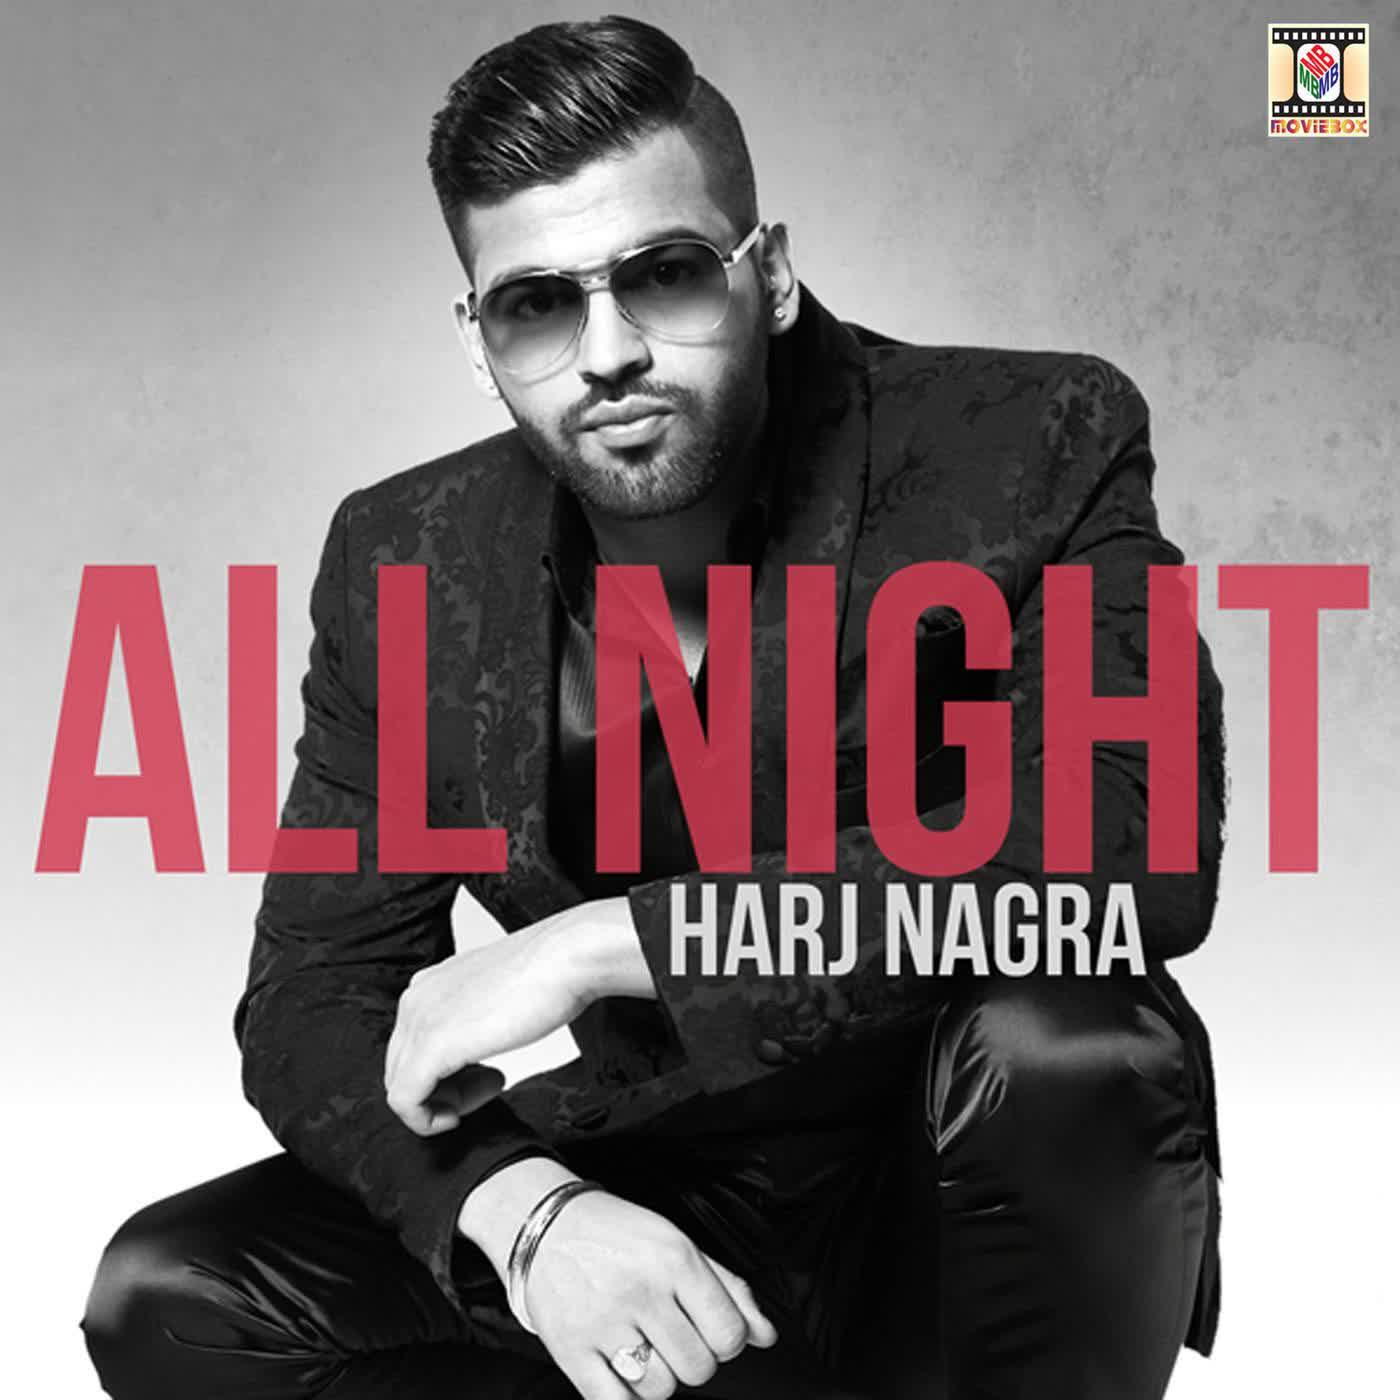 All Night Harj Nagra